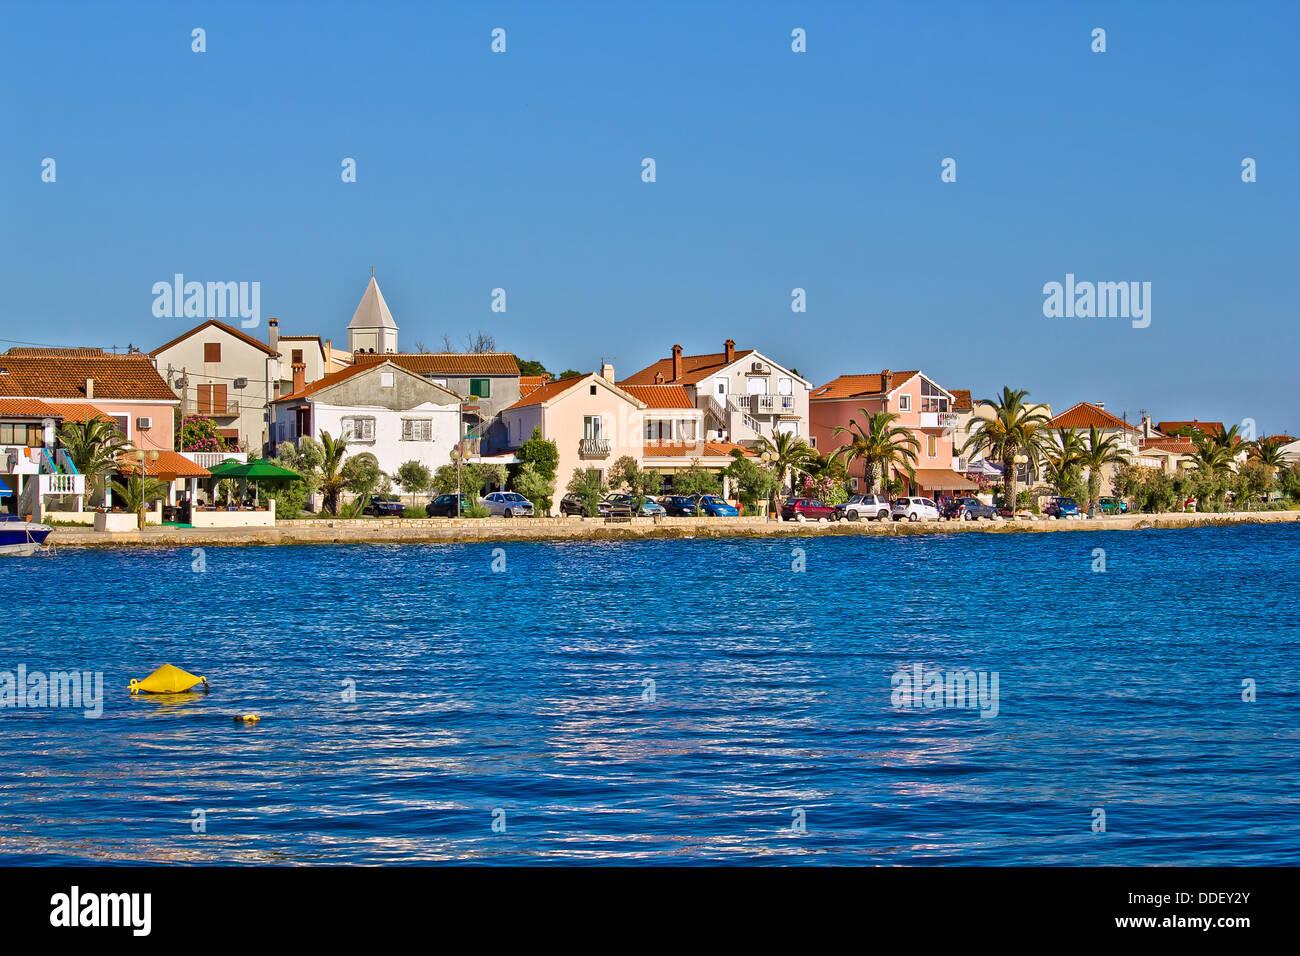 Adriatic Town of Petrcane waterfront, Dalmatia, Croatia - Stock Image